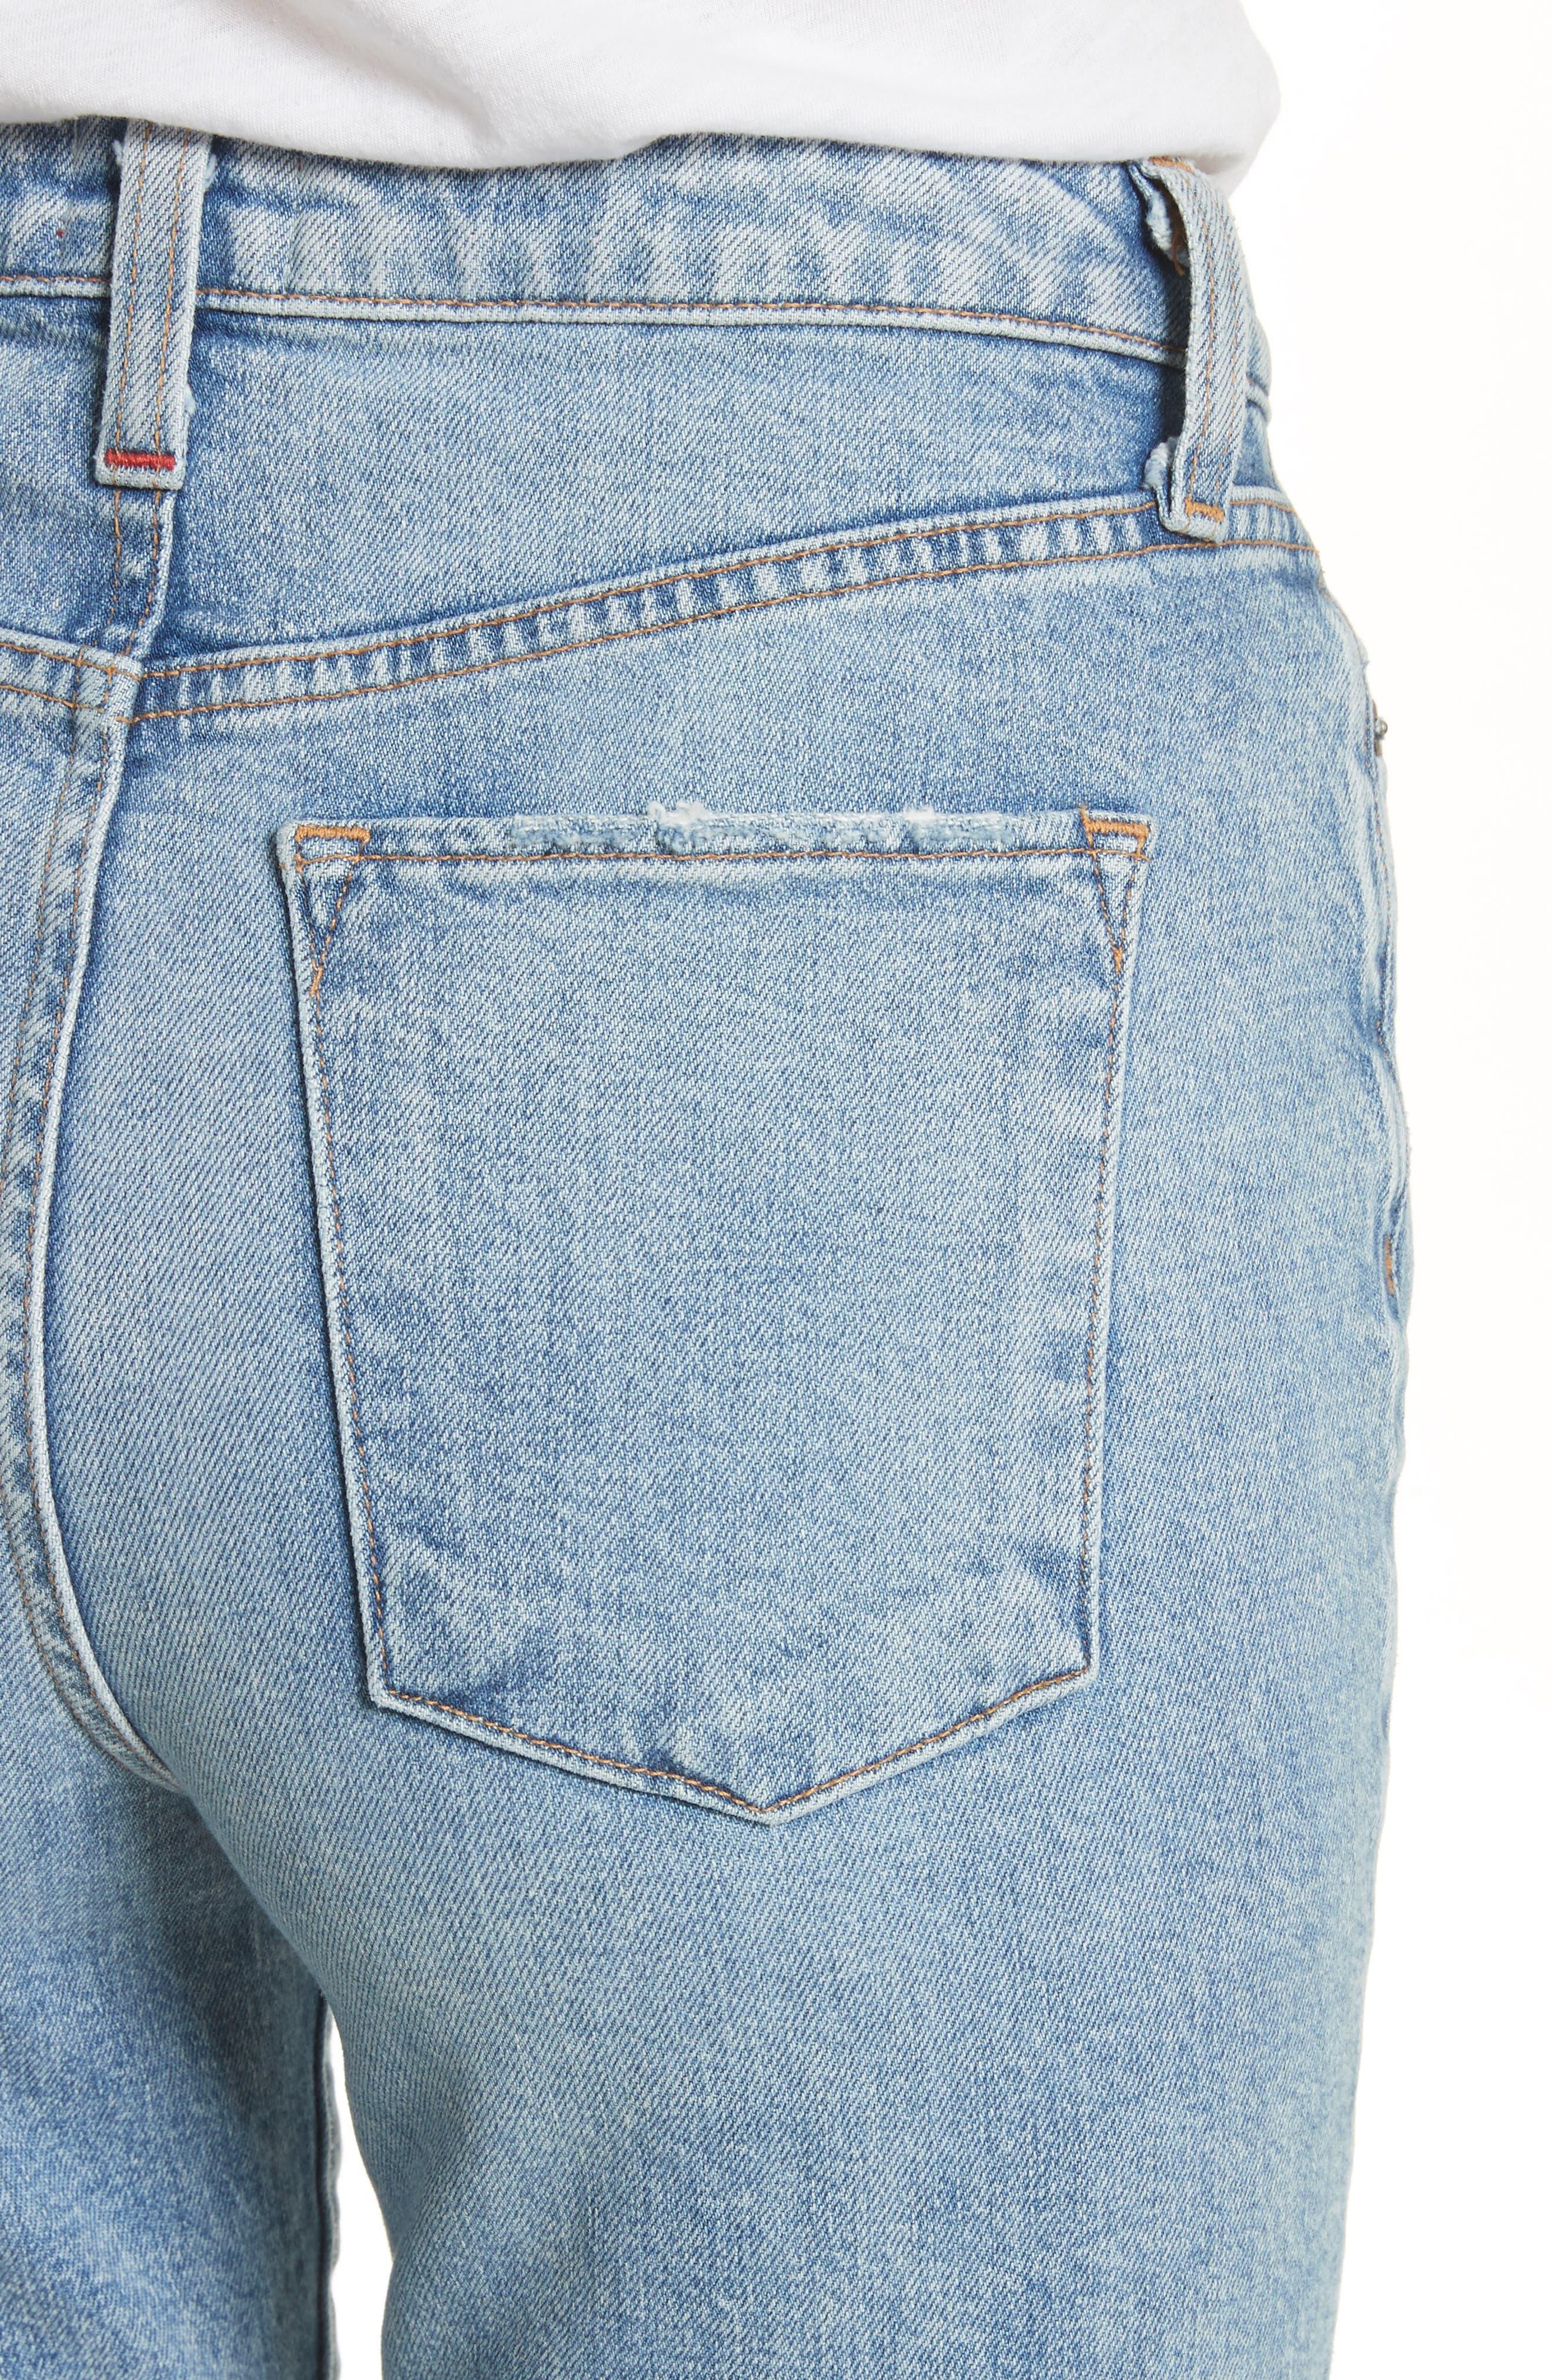 AO.LA Fabulous High Waist Baby Bootcut Jeans,                             Alternate thumbnail 4, color,